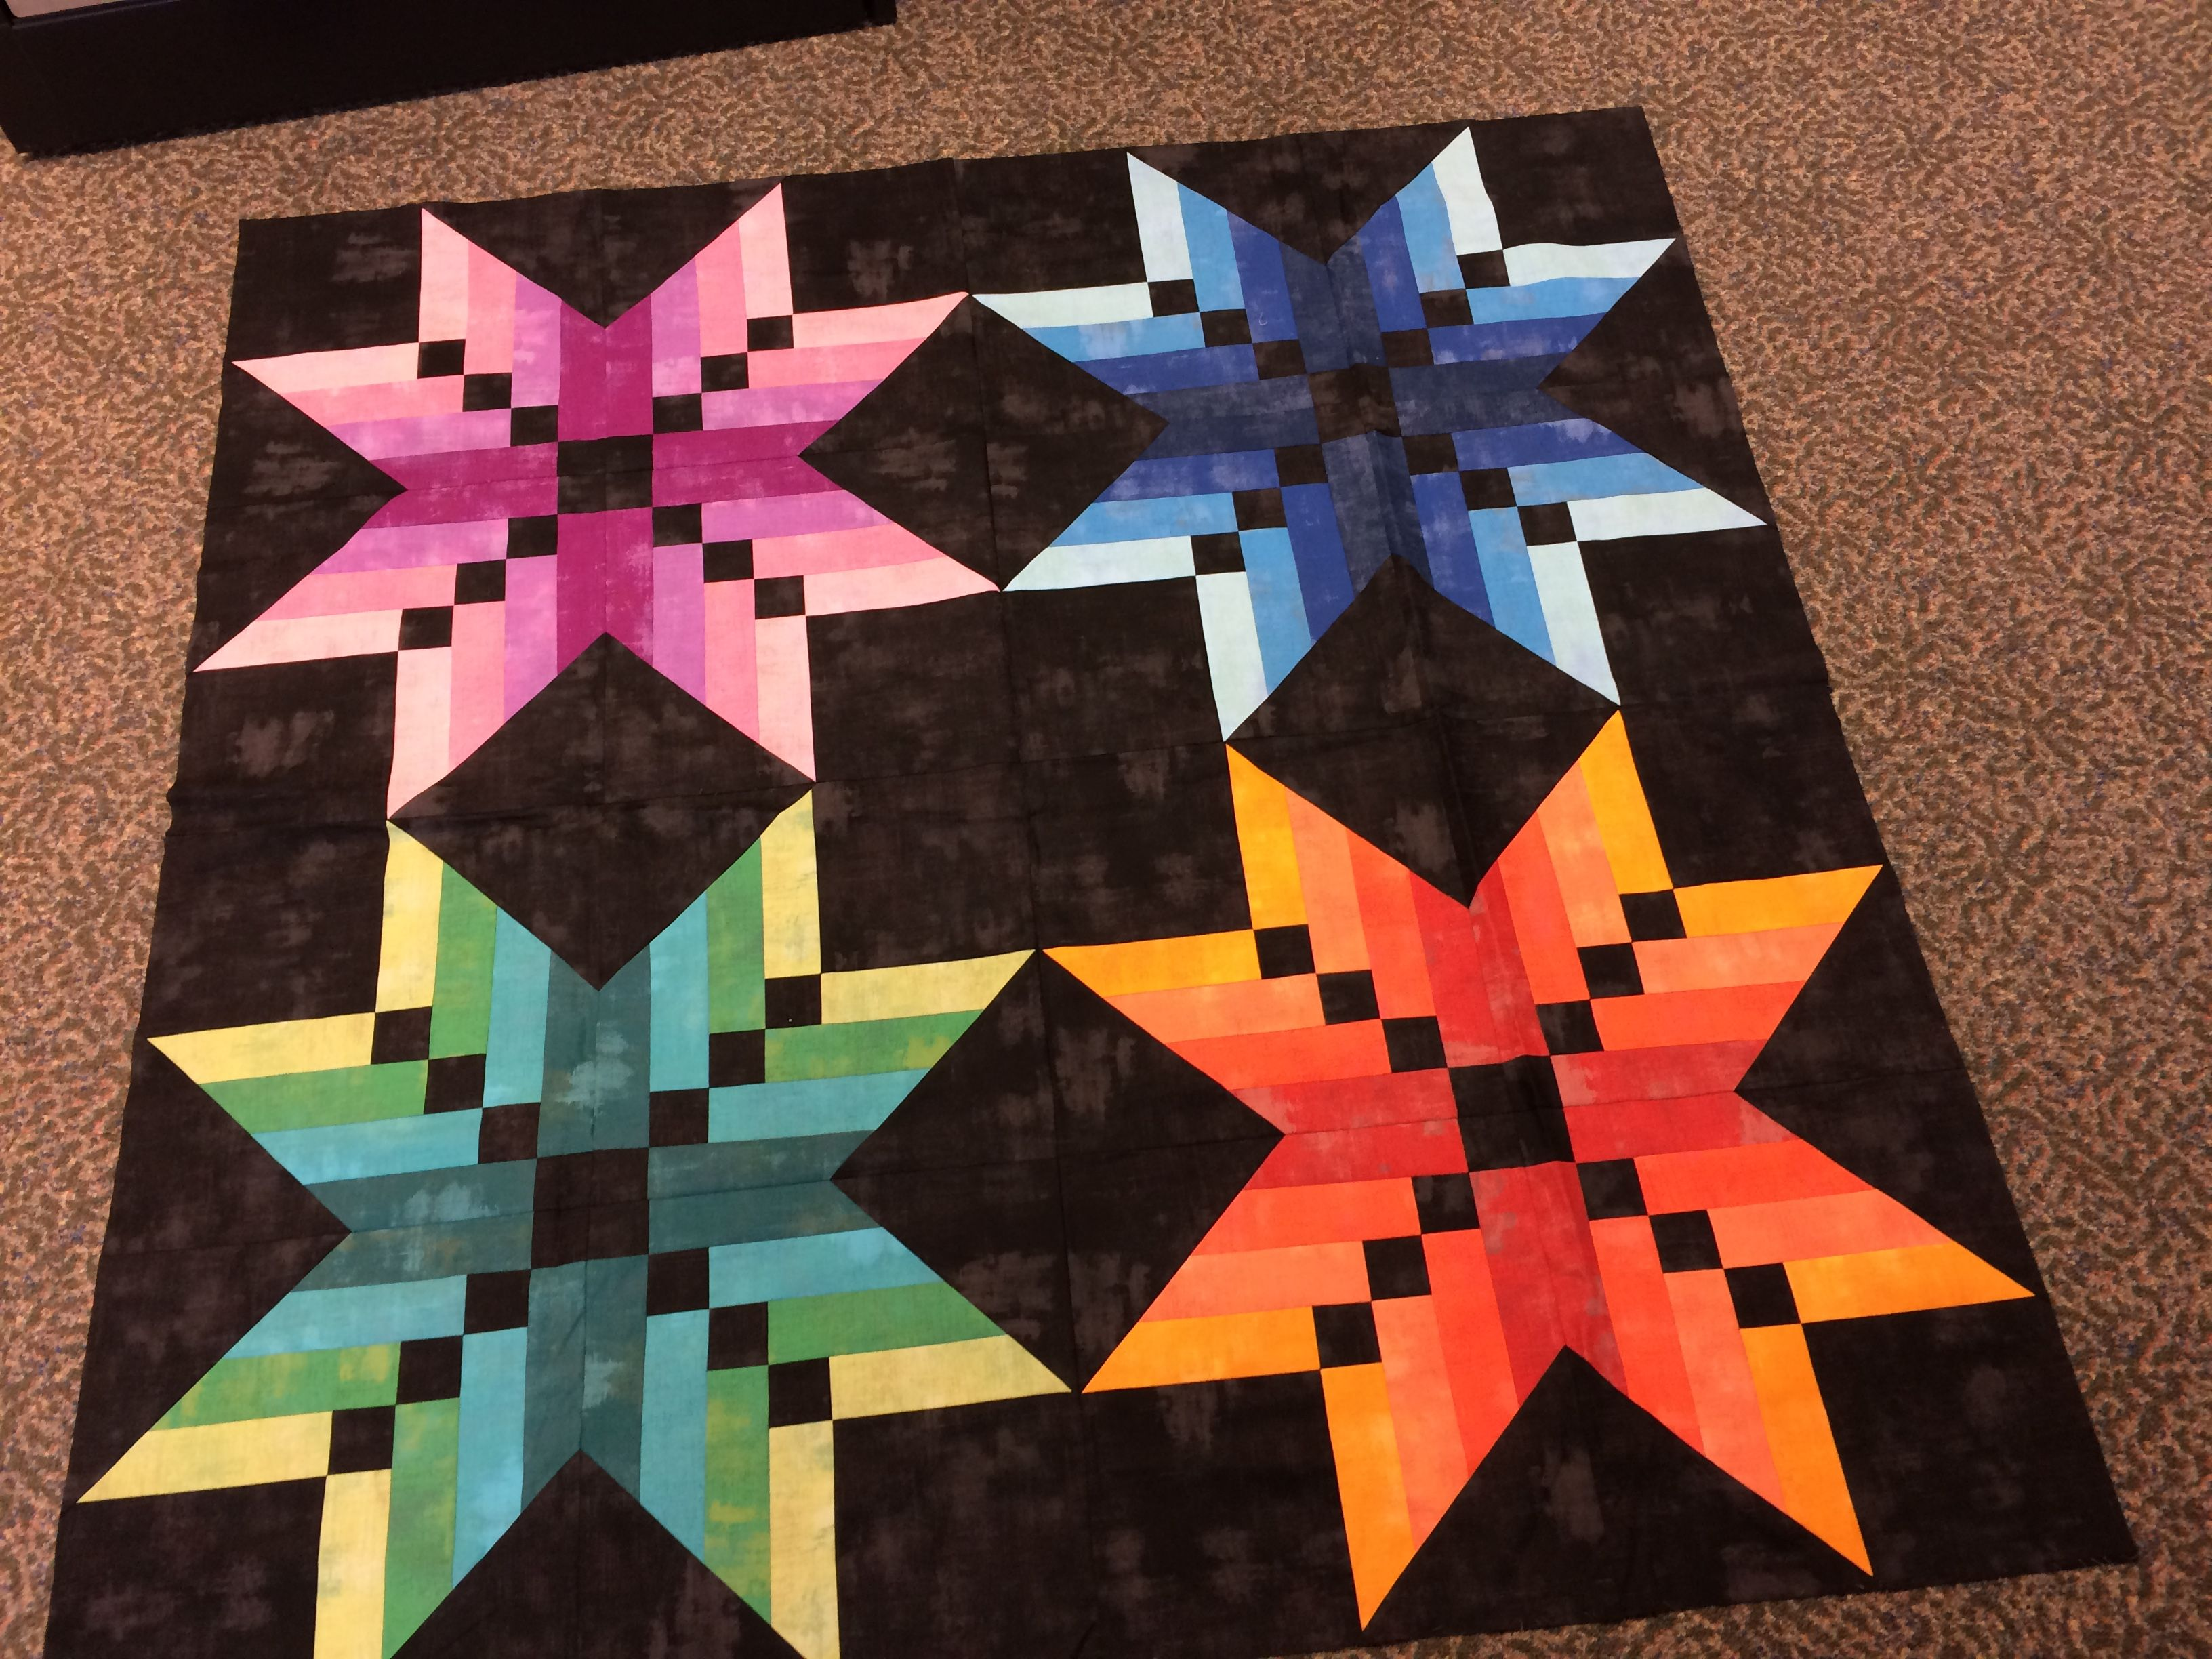 Grunge fabric by Basic Gray for Moda, Binding Tool Star quilt ... : missouri quilt company patterns - Adamdwight.com